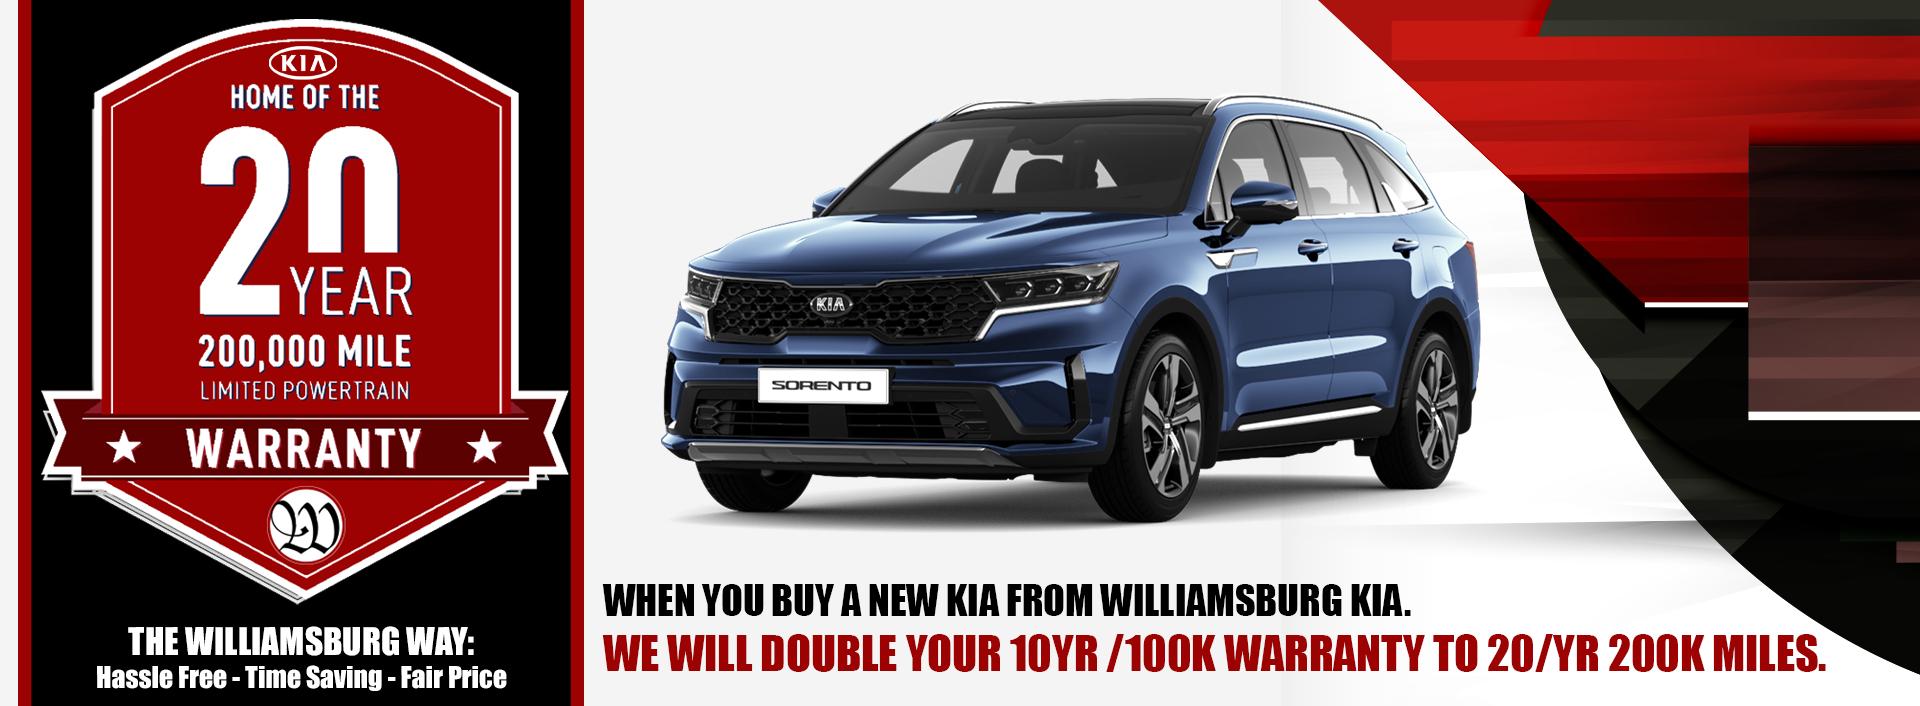 Williamsburg Kia Warranty Plan